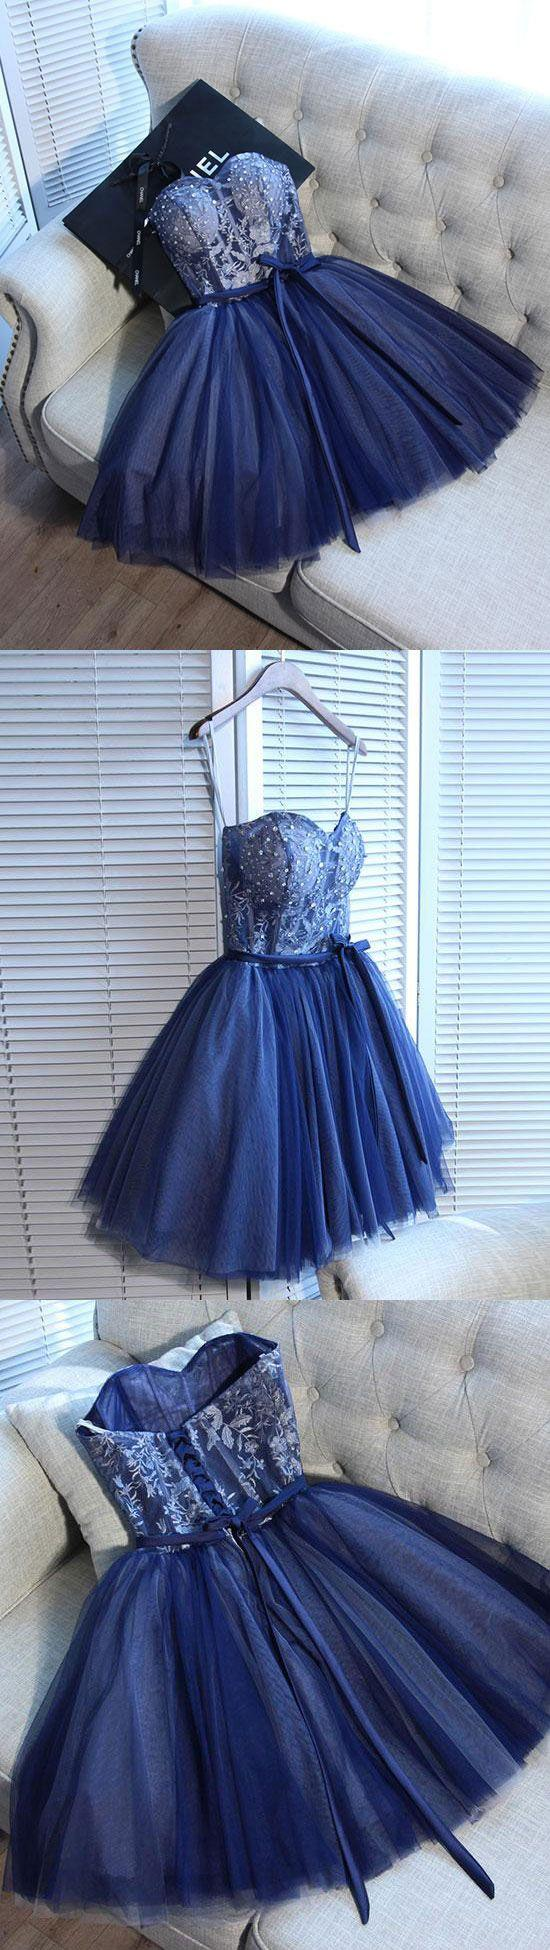 Kleiden - Prom Dress LOVE #2798186 - Weddbook